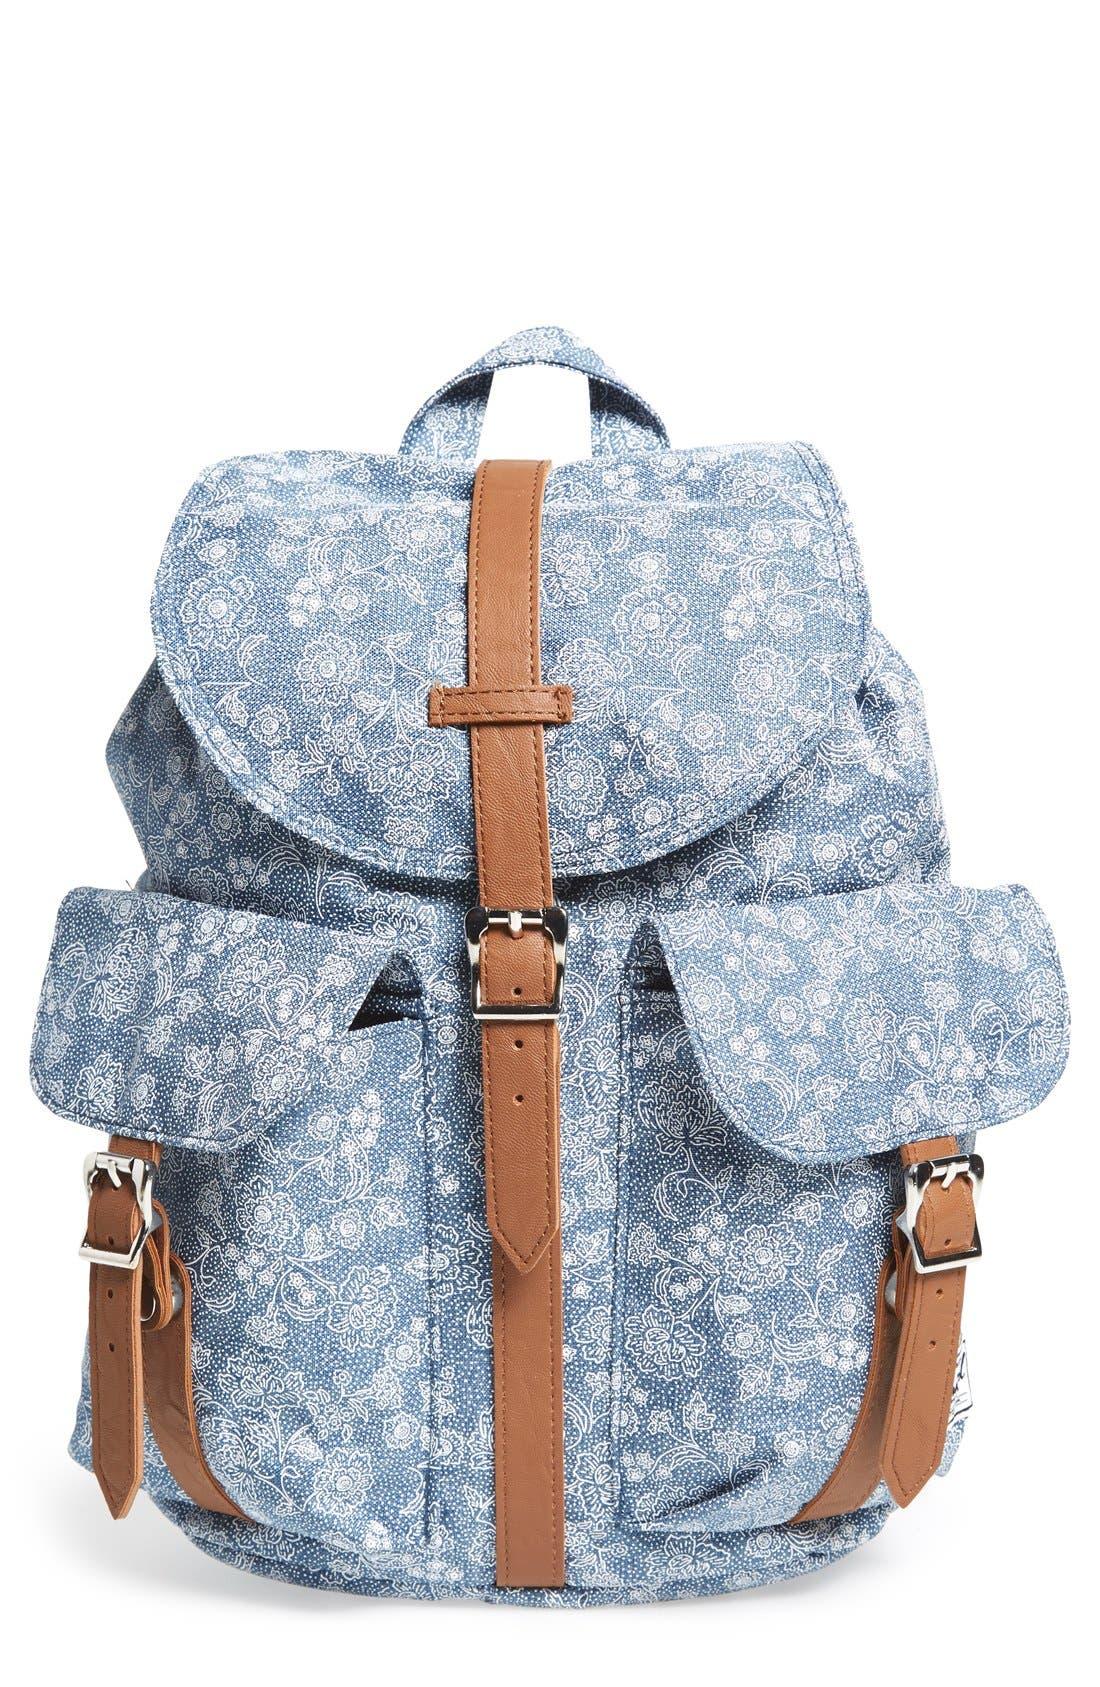 Main Image - Herschel Supply Co 'Dawson - Floral' Backpack